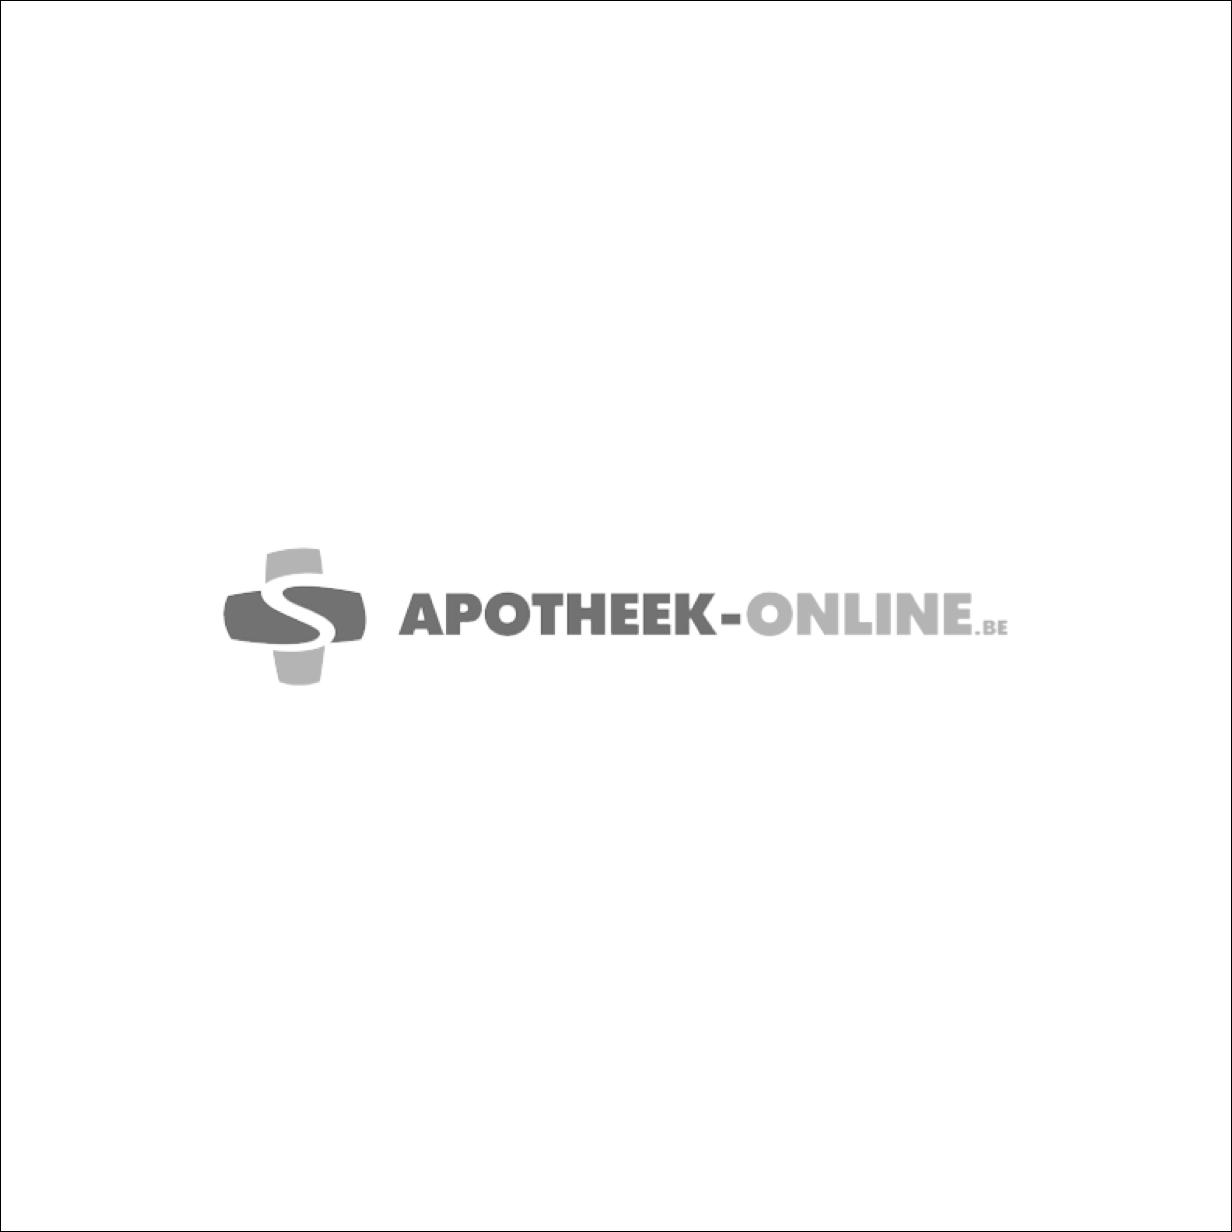 MESOFT CP STER 4C 5,0X 5,0CM 75X 2 156040